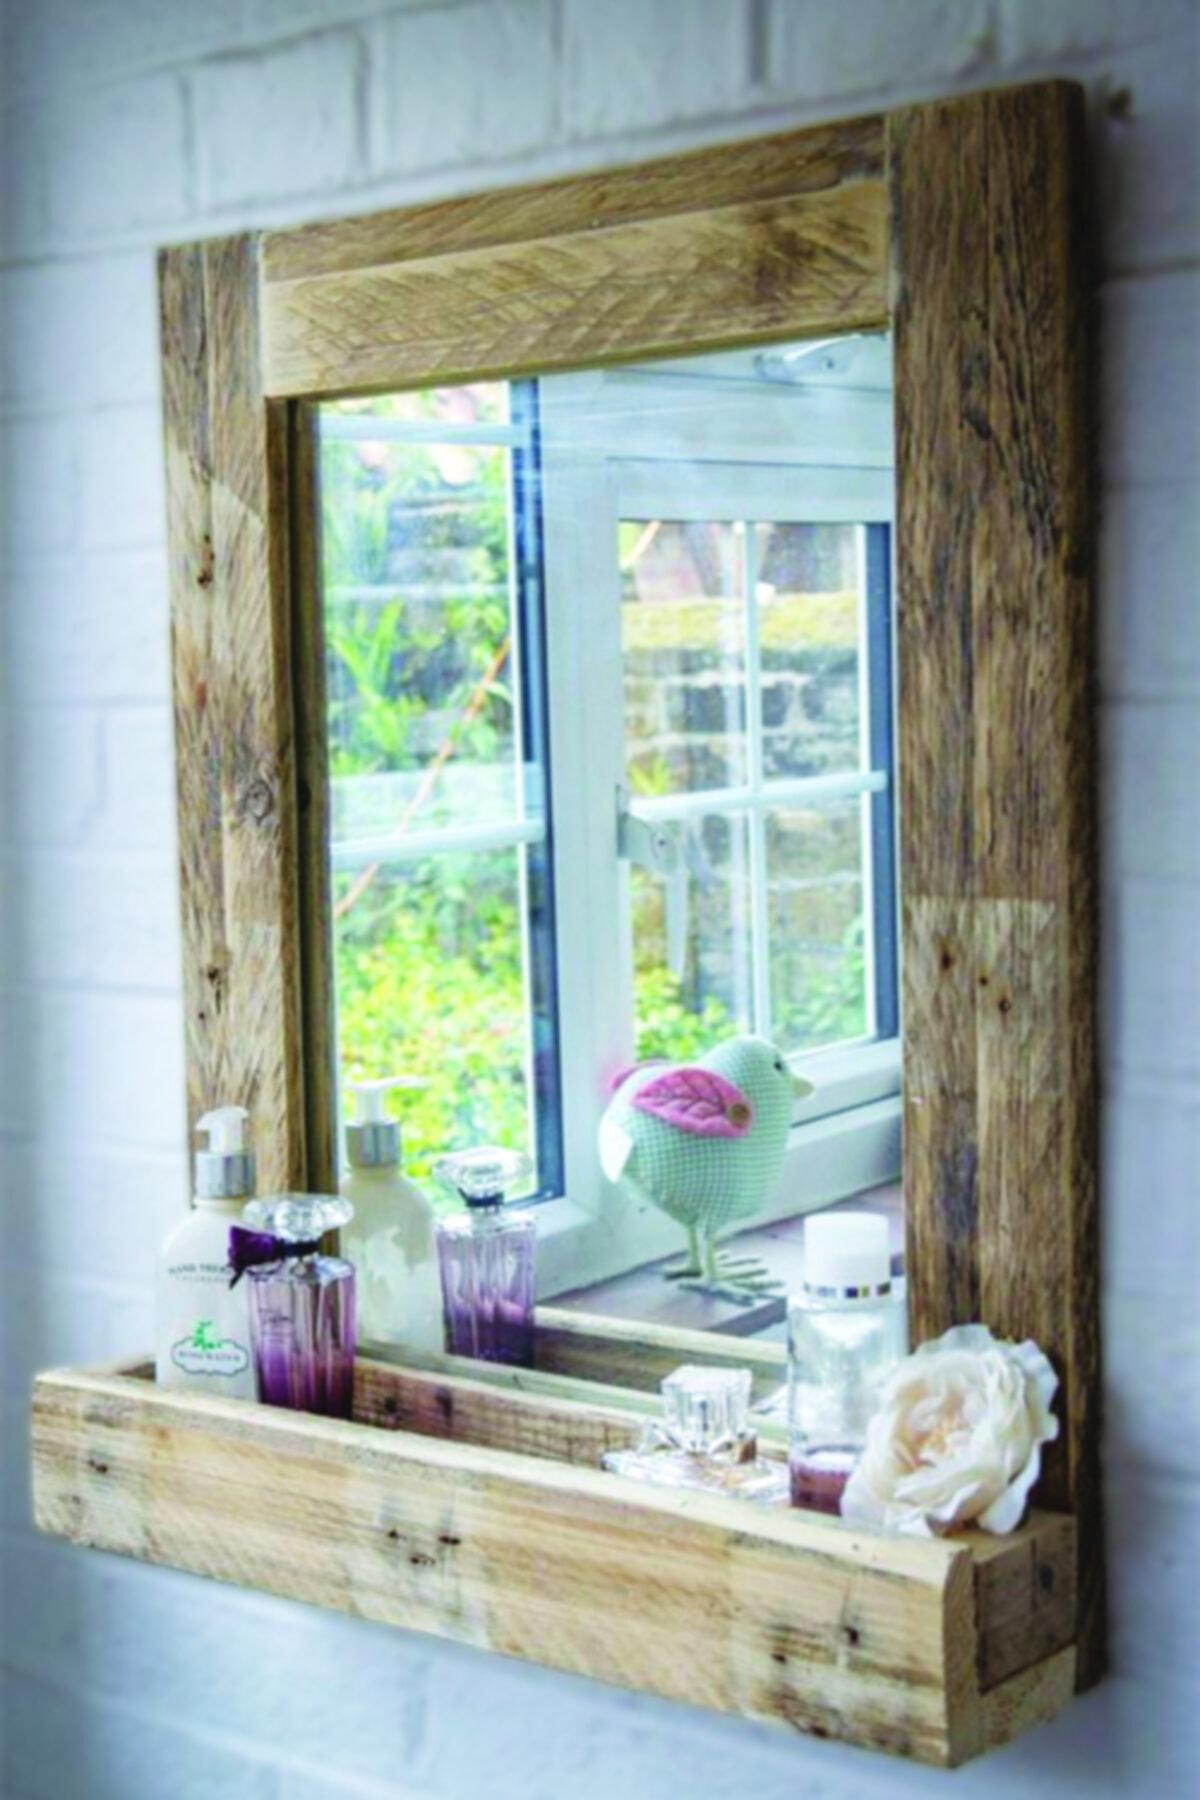 Evmingo Raflı Ayna 65x55cm 1